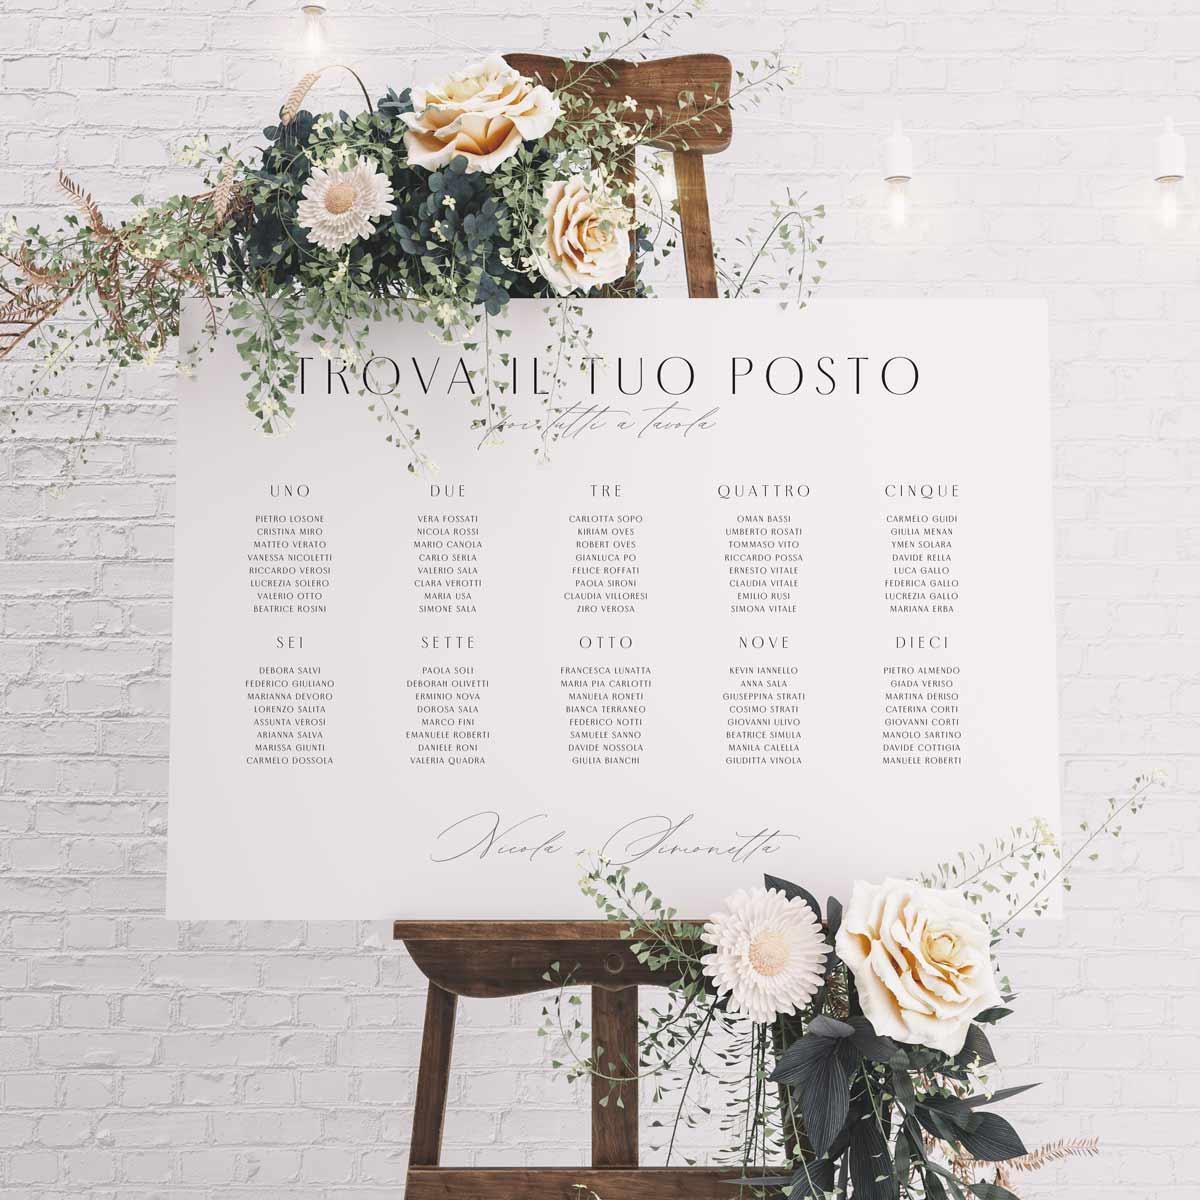 Tableau-de-mariage-wedding-matrimonio-nozze-2020-elegante-moderno-fiori